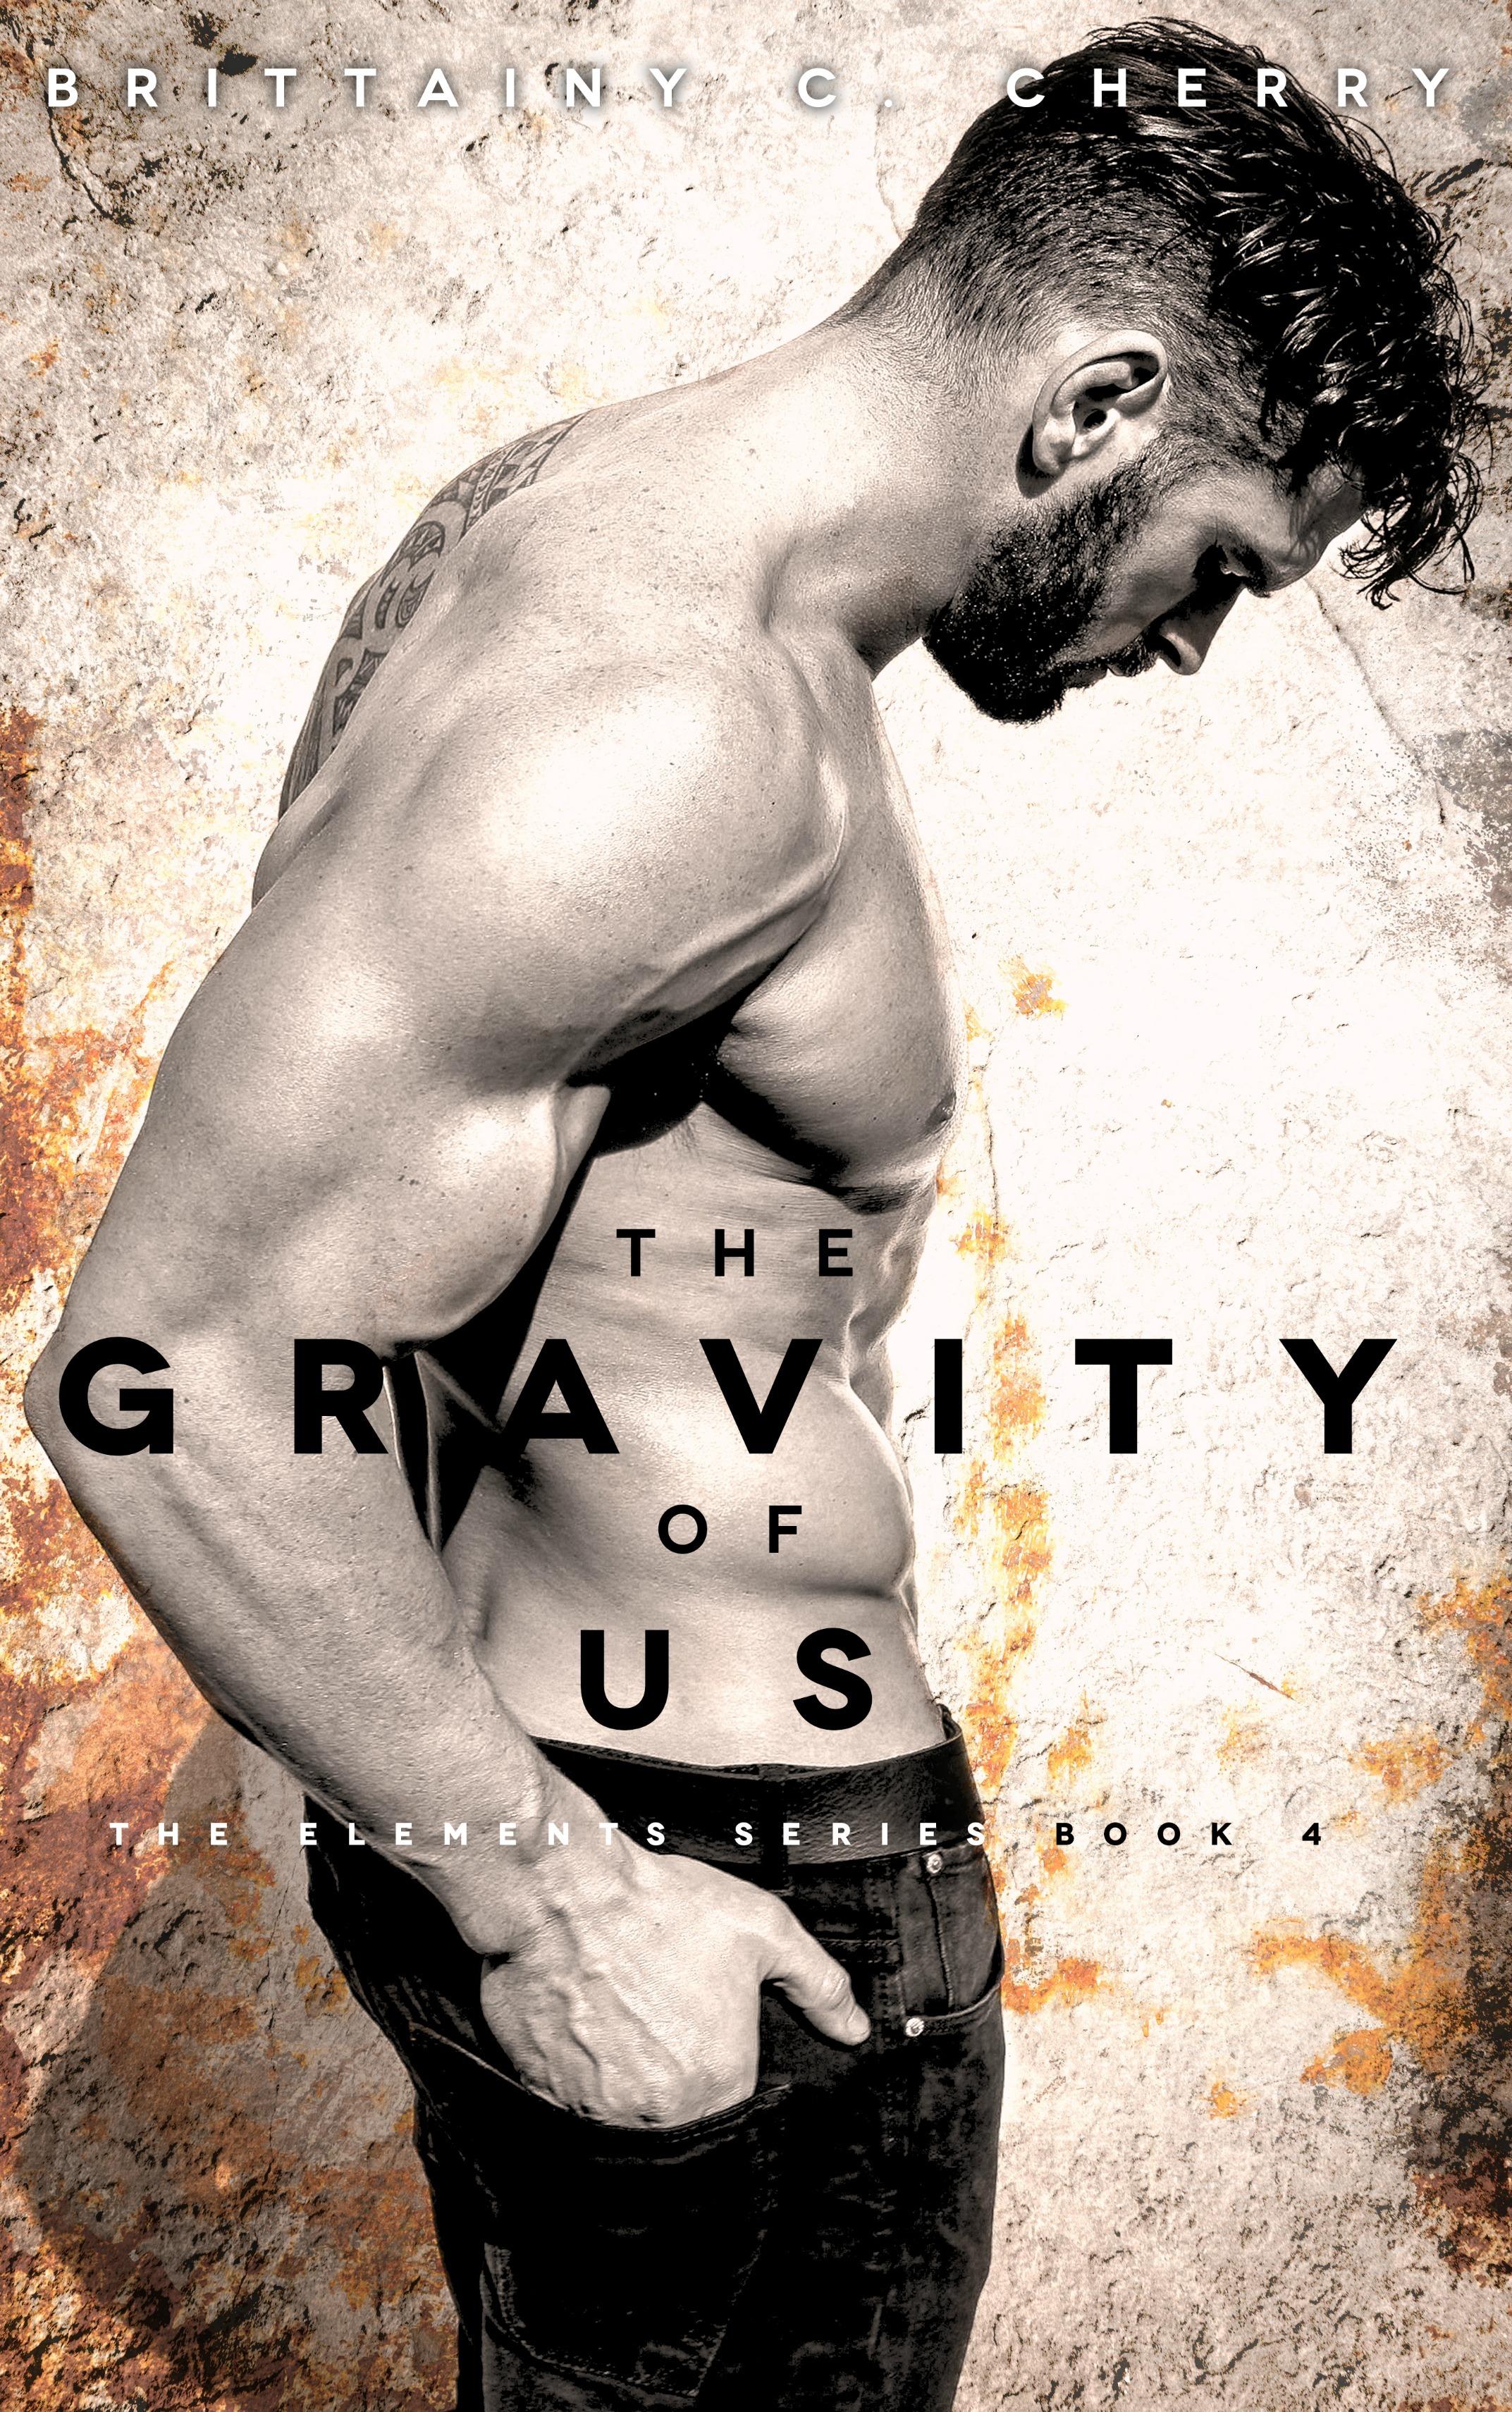 (Elements 4) Cherry, Brittainy C. Cherry - The Gravity of Us